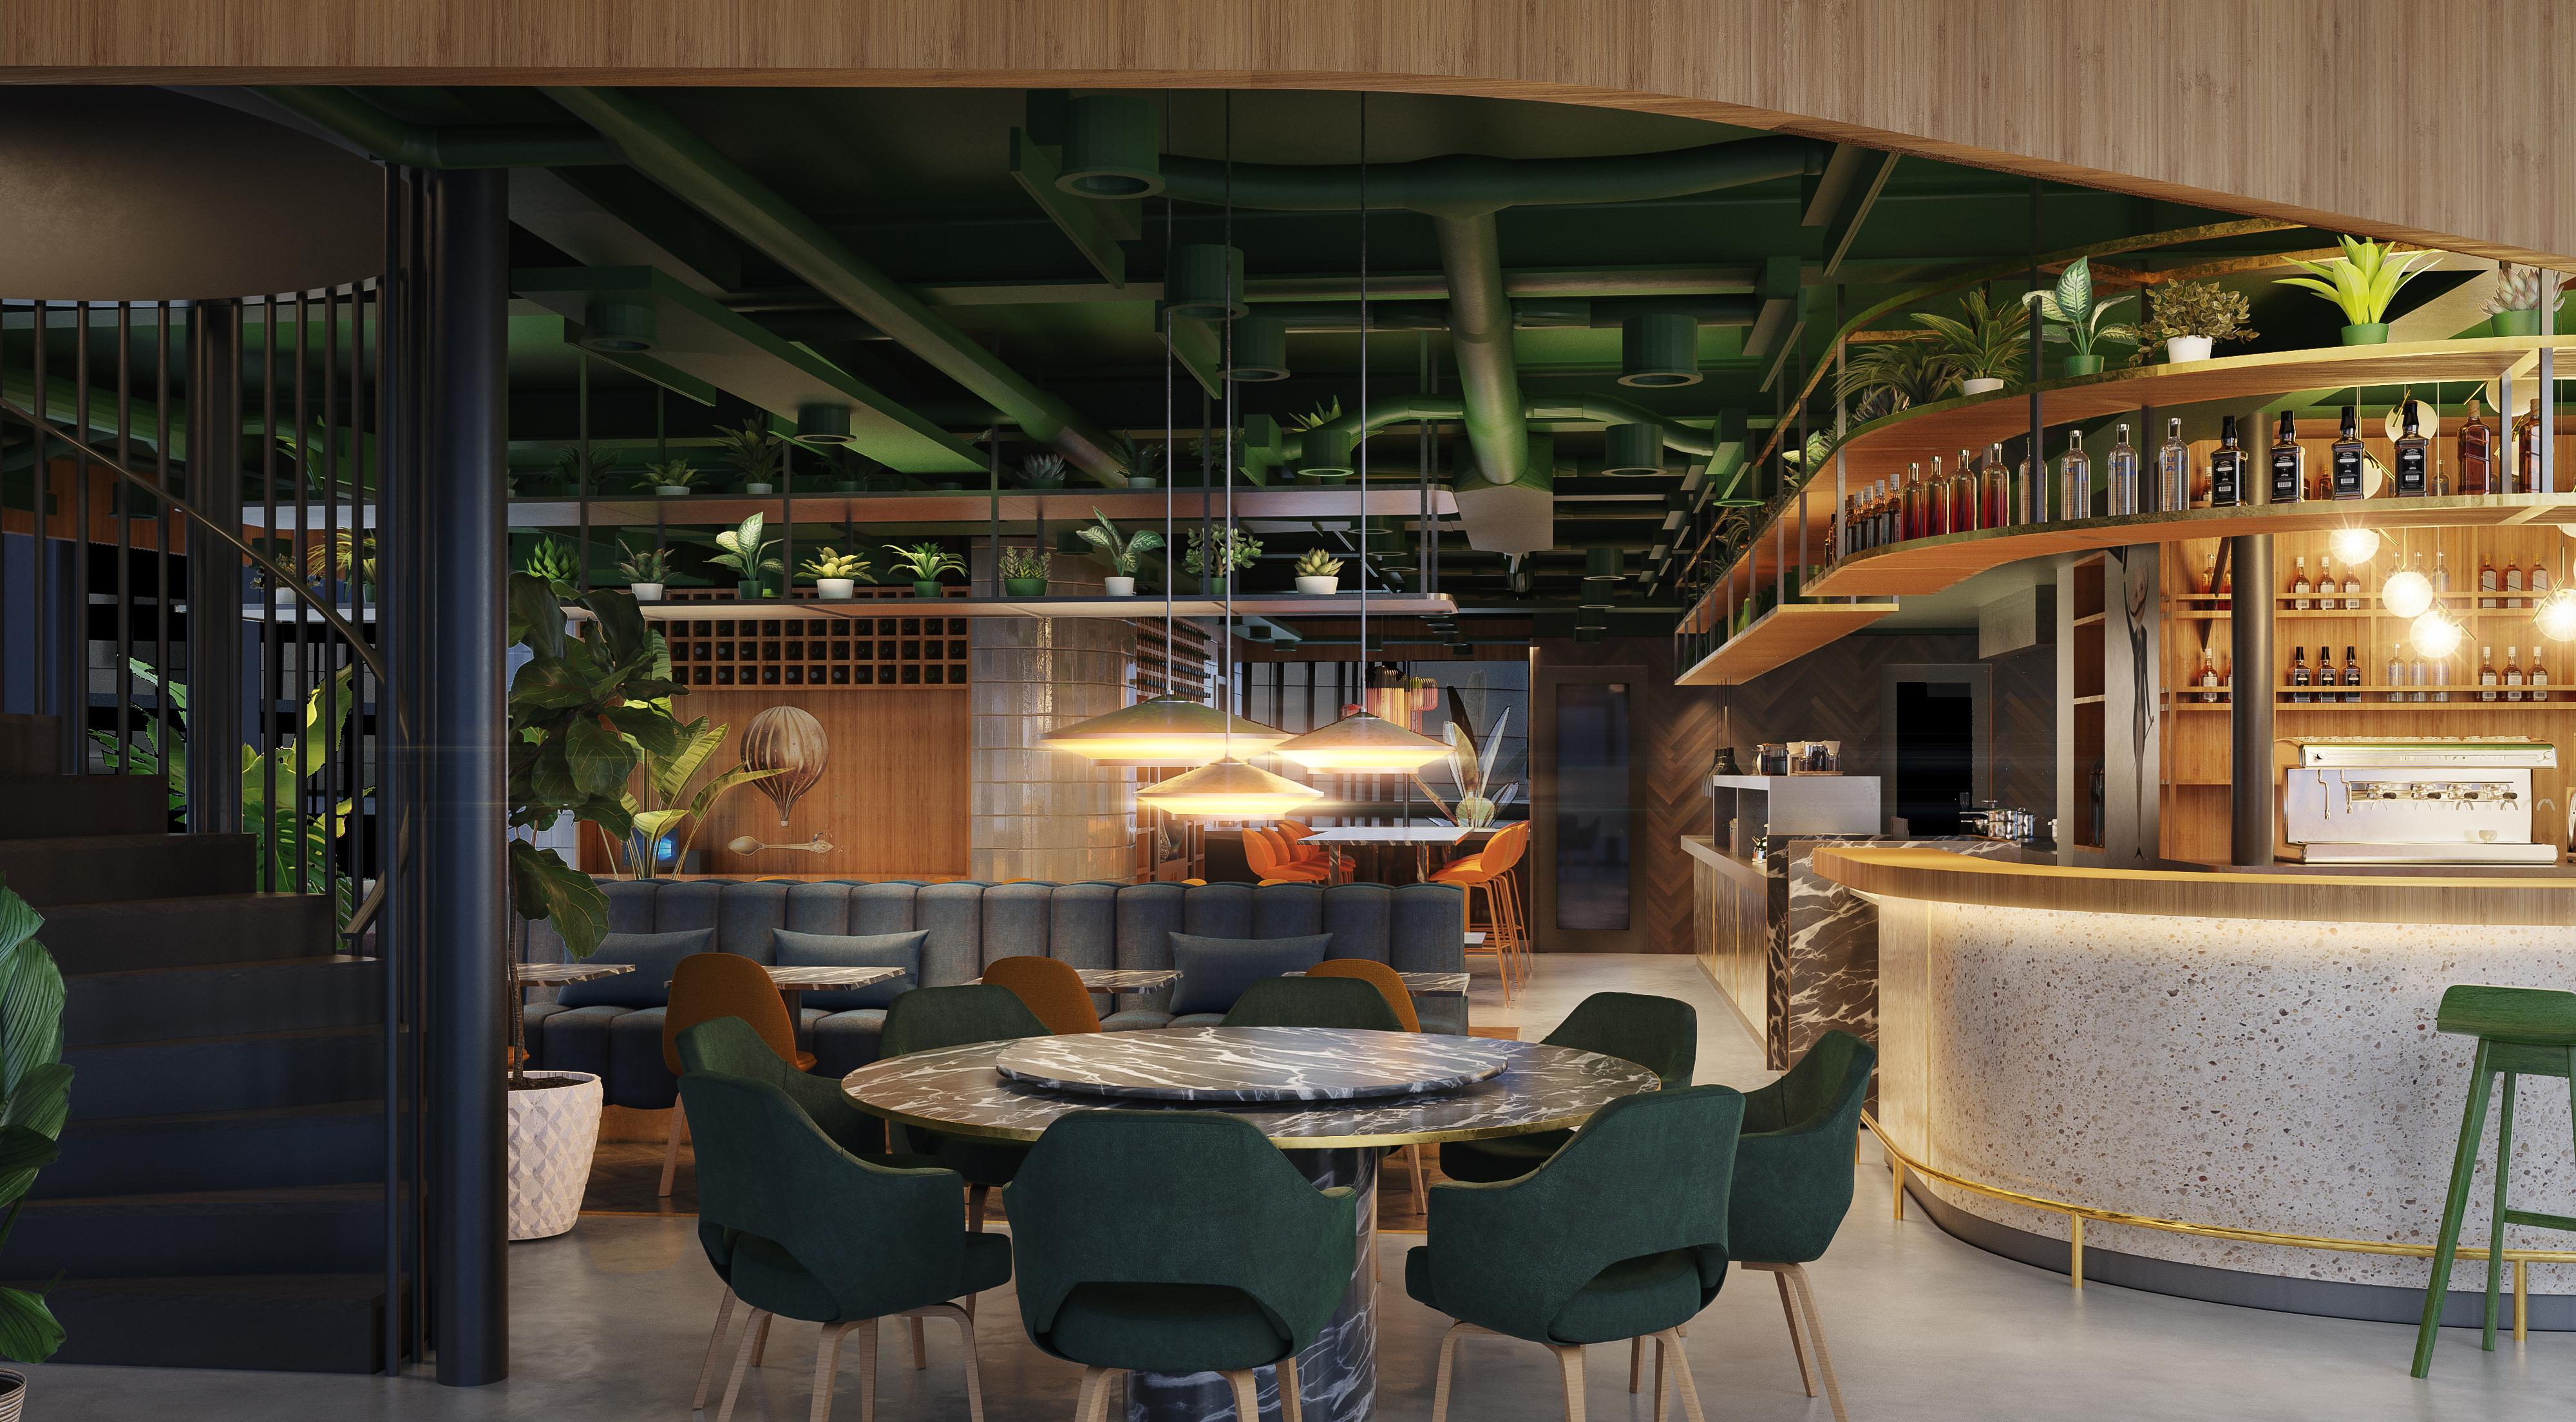 <p>Interieur restaurant begane grond. Beeld: Powerhouse Company</p>